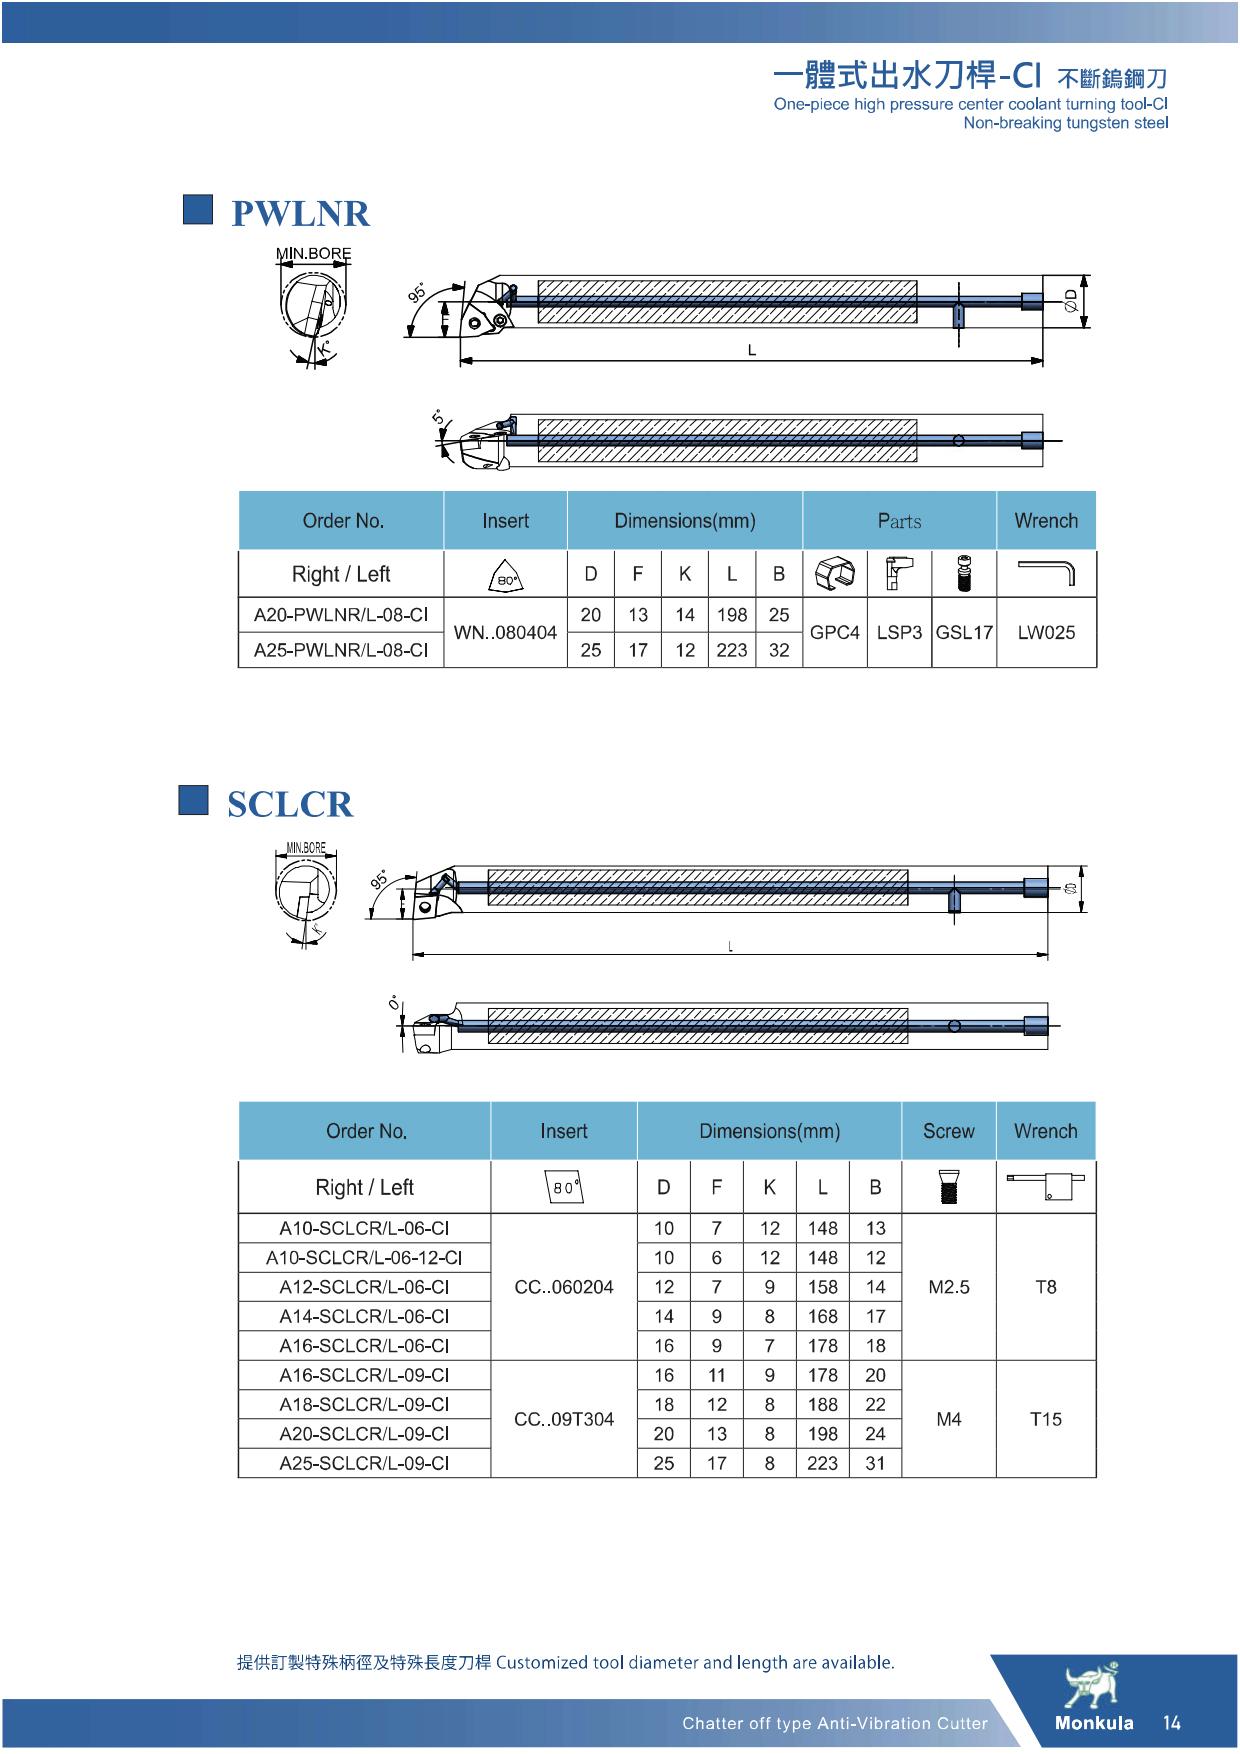 Cán Dao Tiện Móc Lỗ Chống Rung Monkula One Piece High Pressure Coolant 3